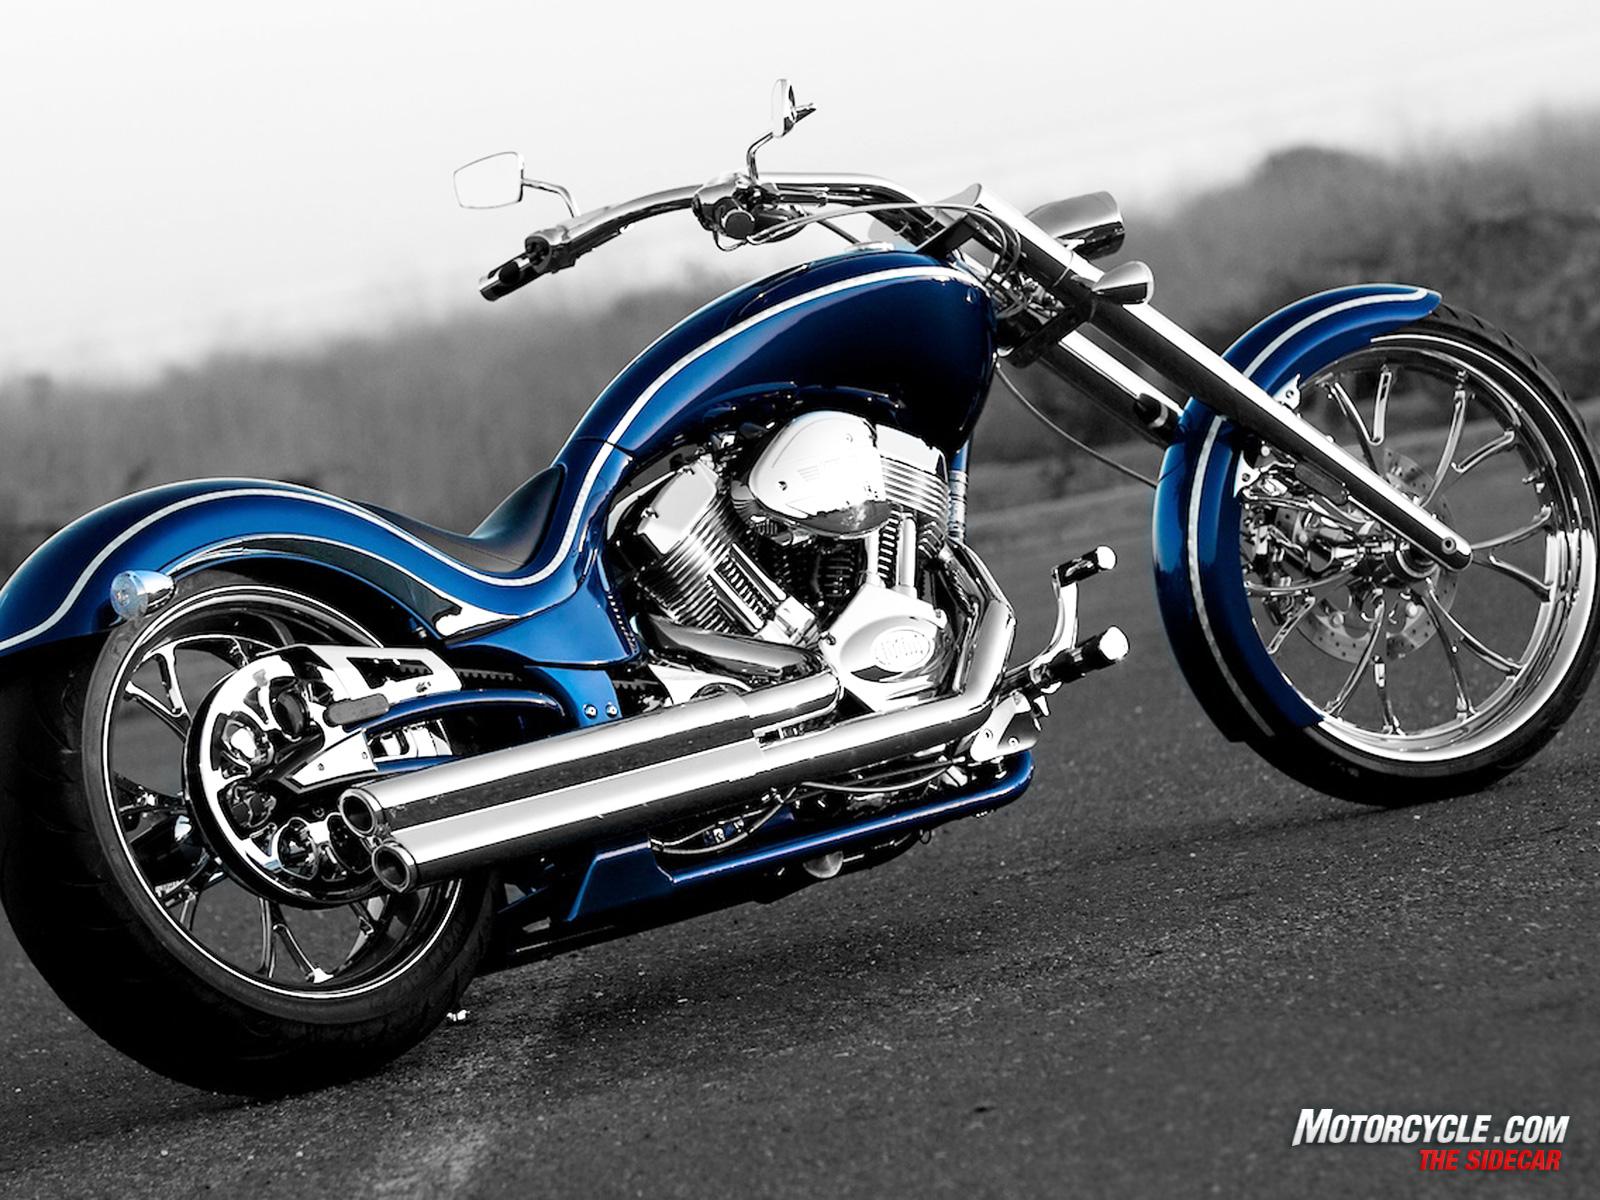 dog motorcycles motorcycle victory wallpapers pow biker website sidecar june dogs motorbikes softly 2008 visit